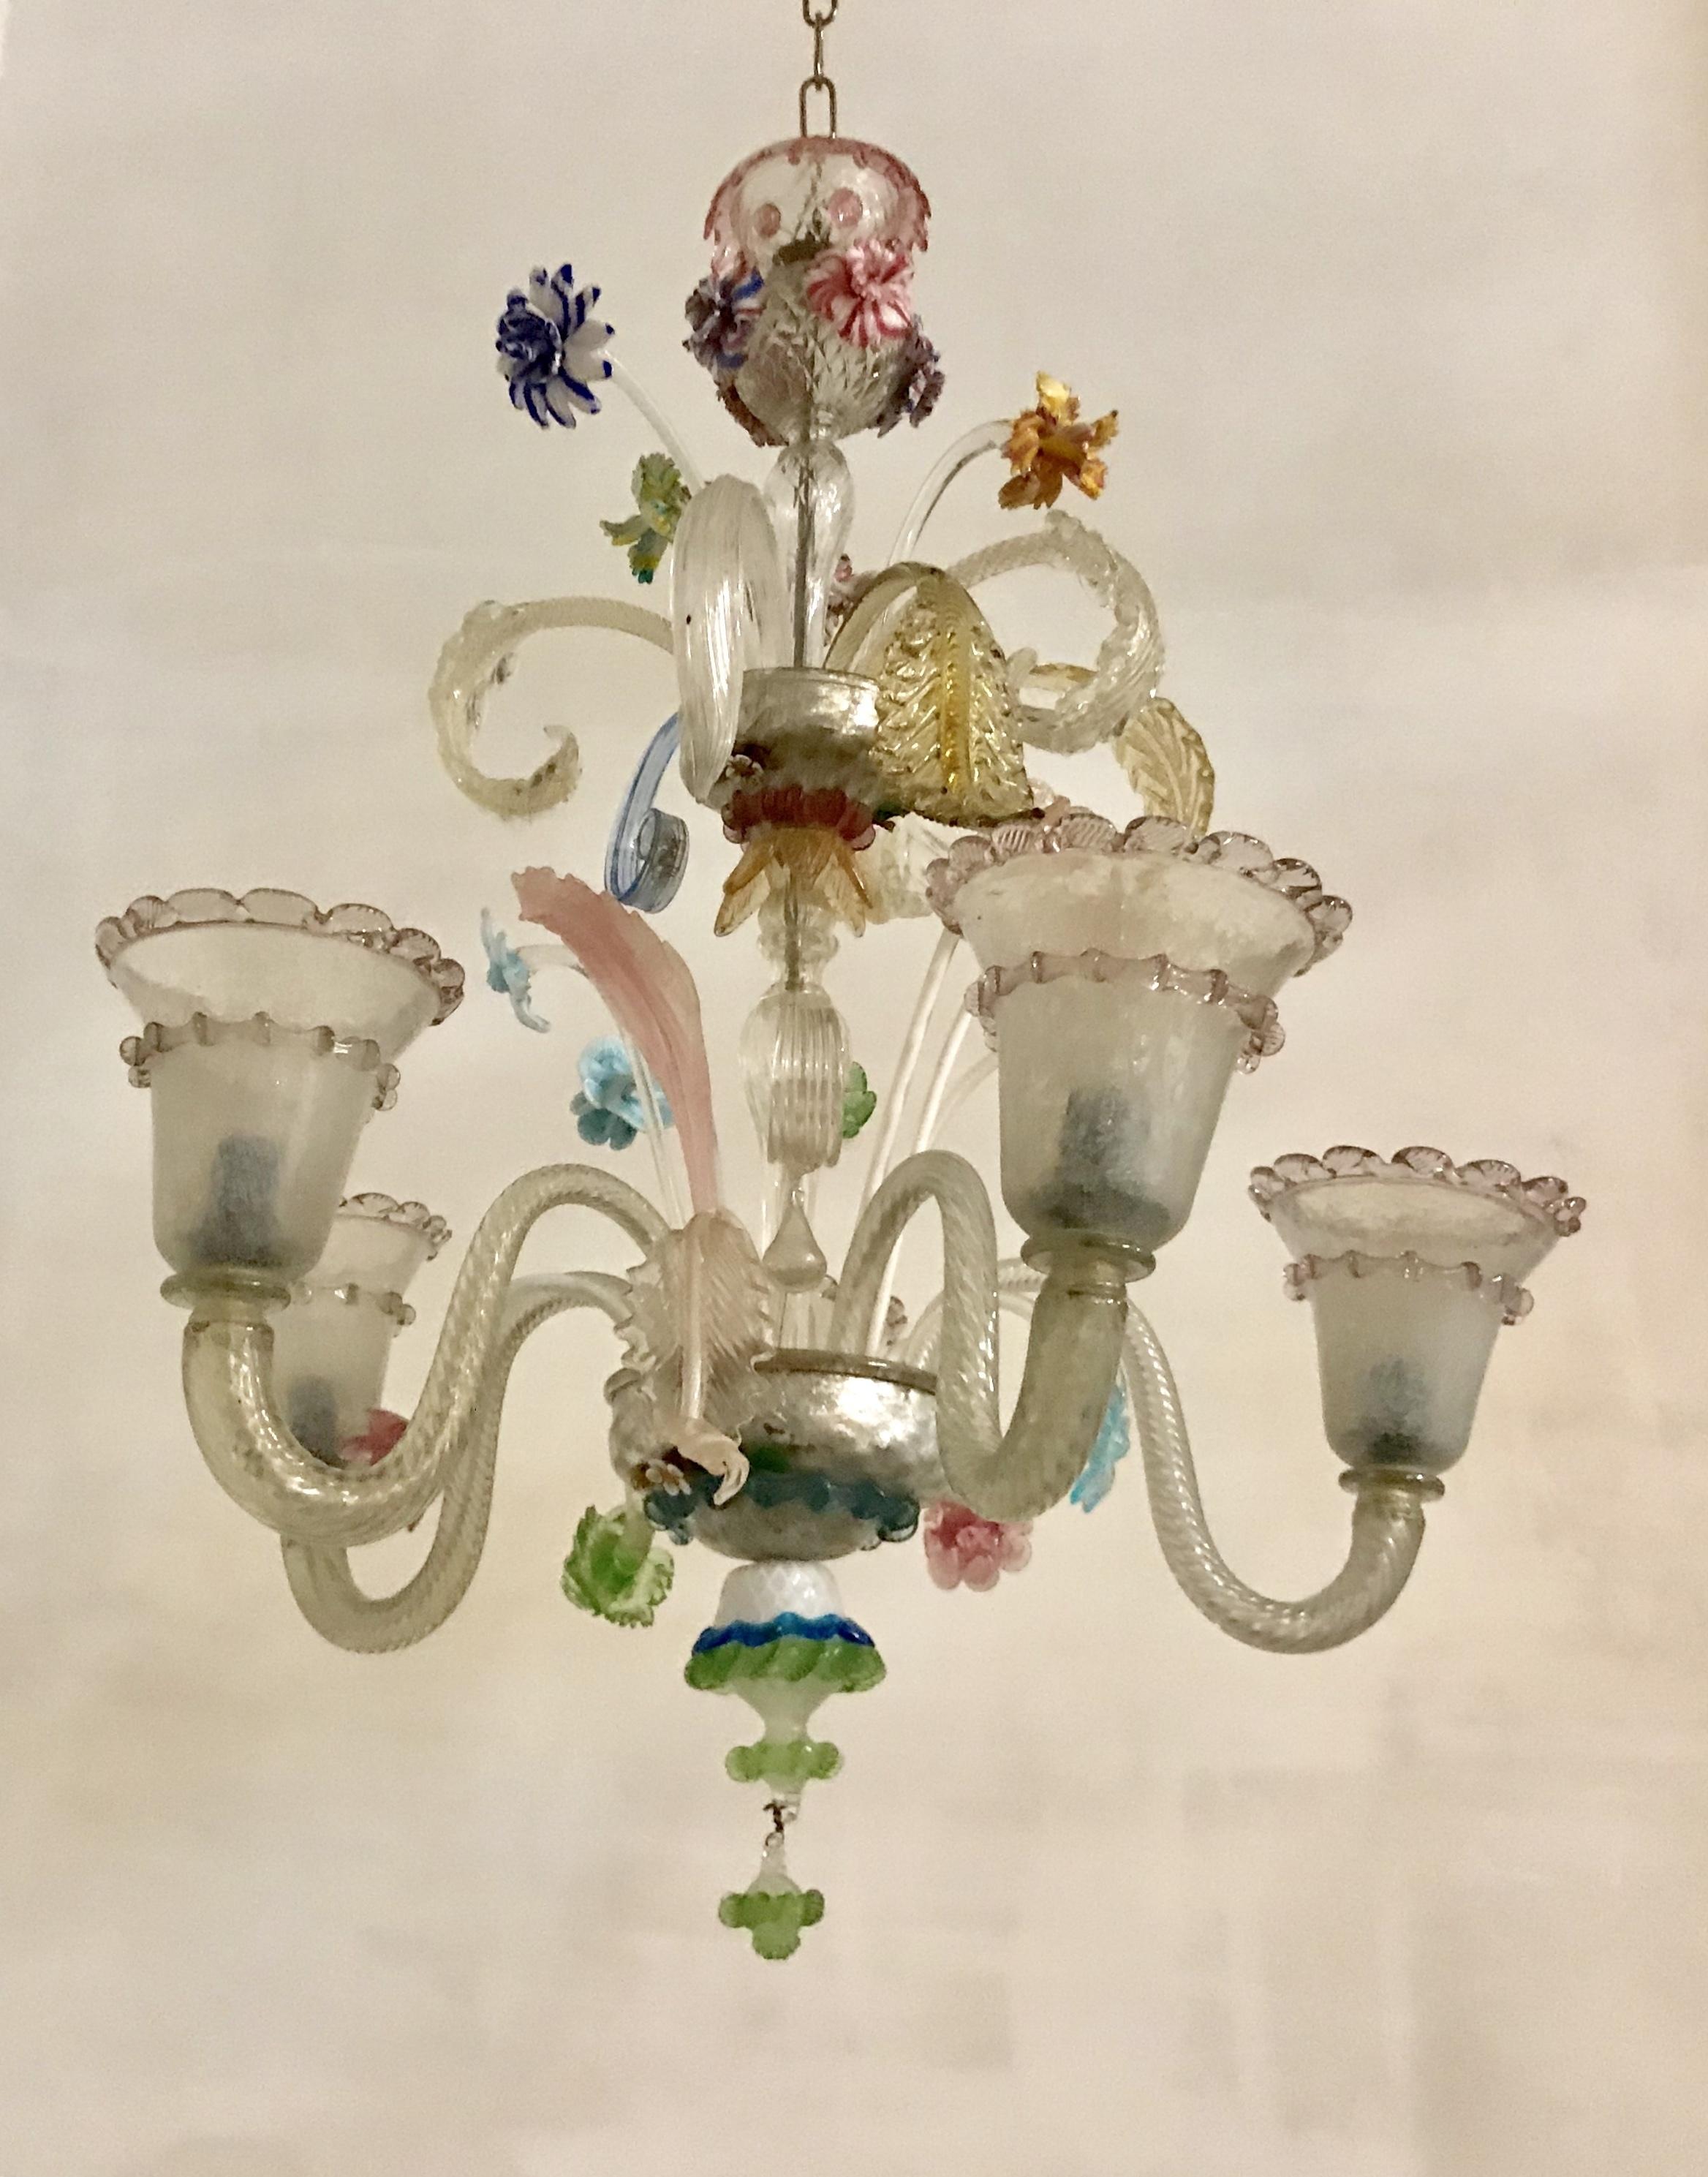 Murano Glass 5 Arm Chandelier, 1940s